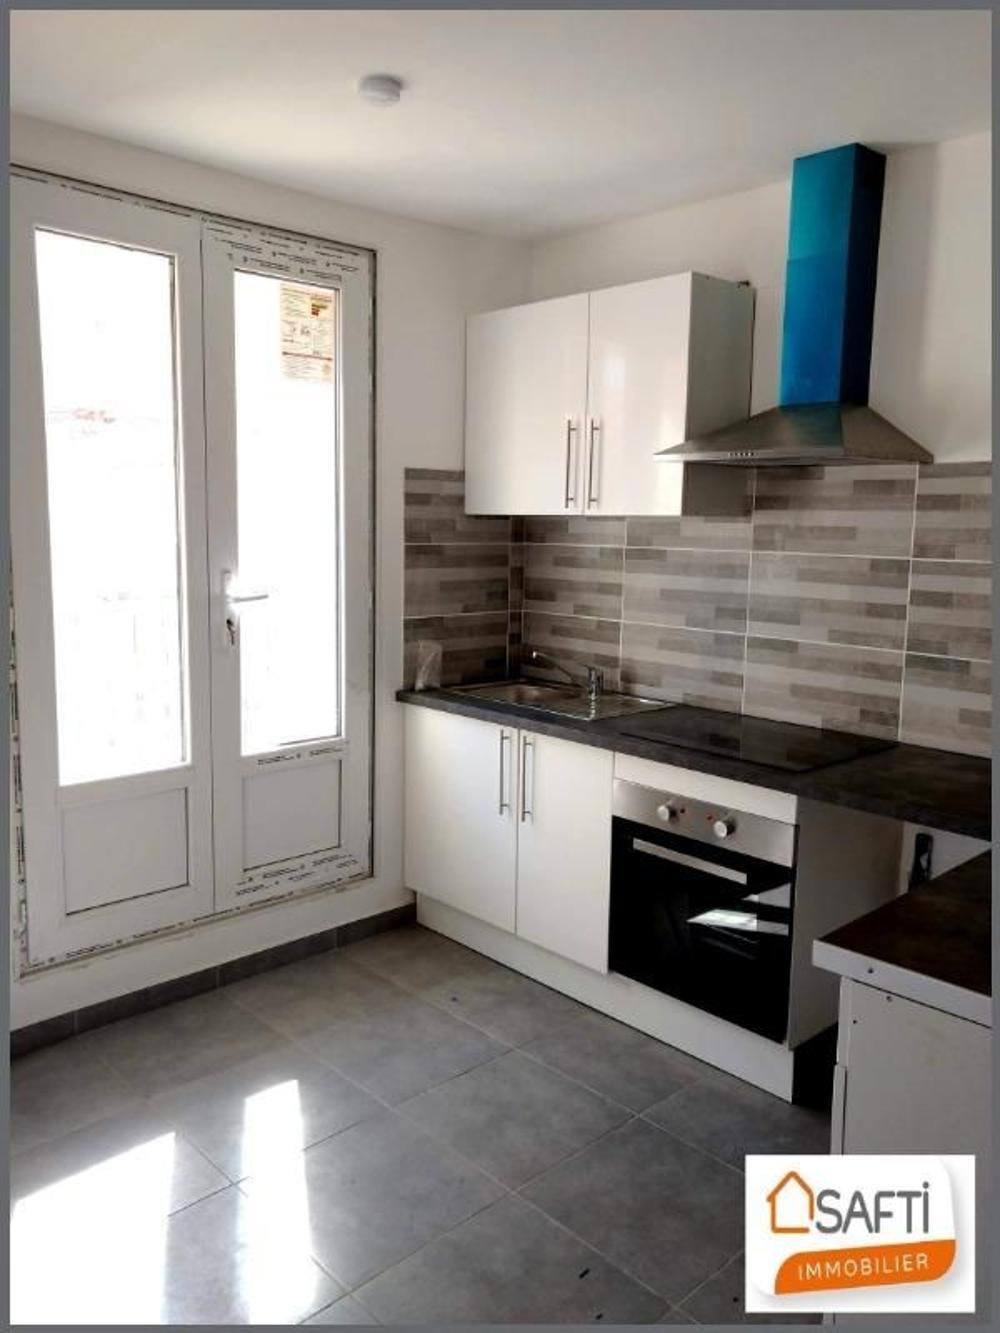 Boujan-sur-Libron Hérault Haus Bild 3466051